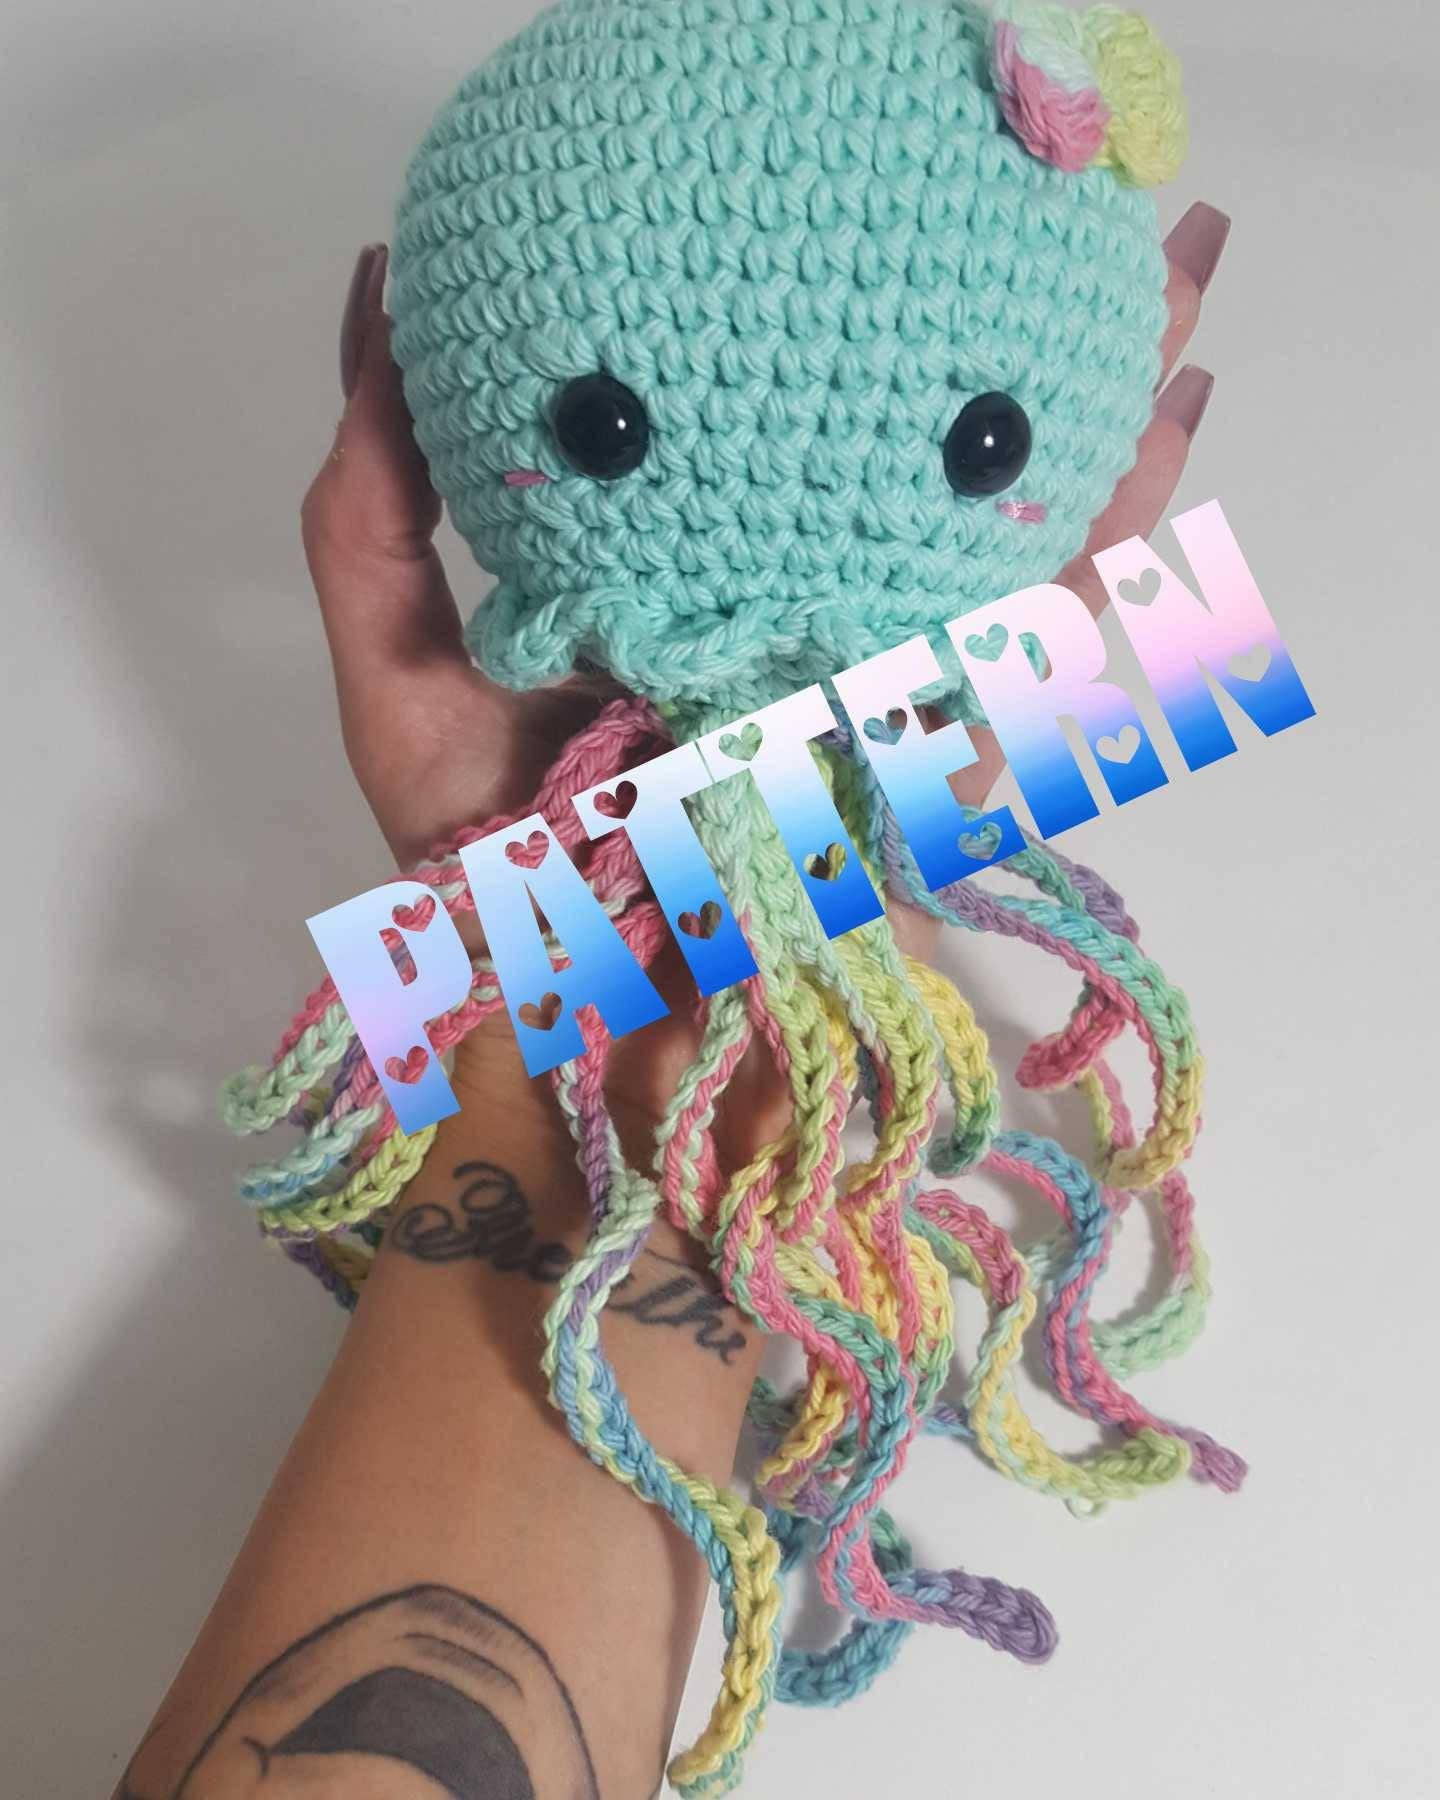 Kawaii Jellyfish Pattern Crochet Jellyfish Pattern Amigurumi | Etsy